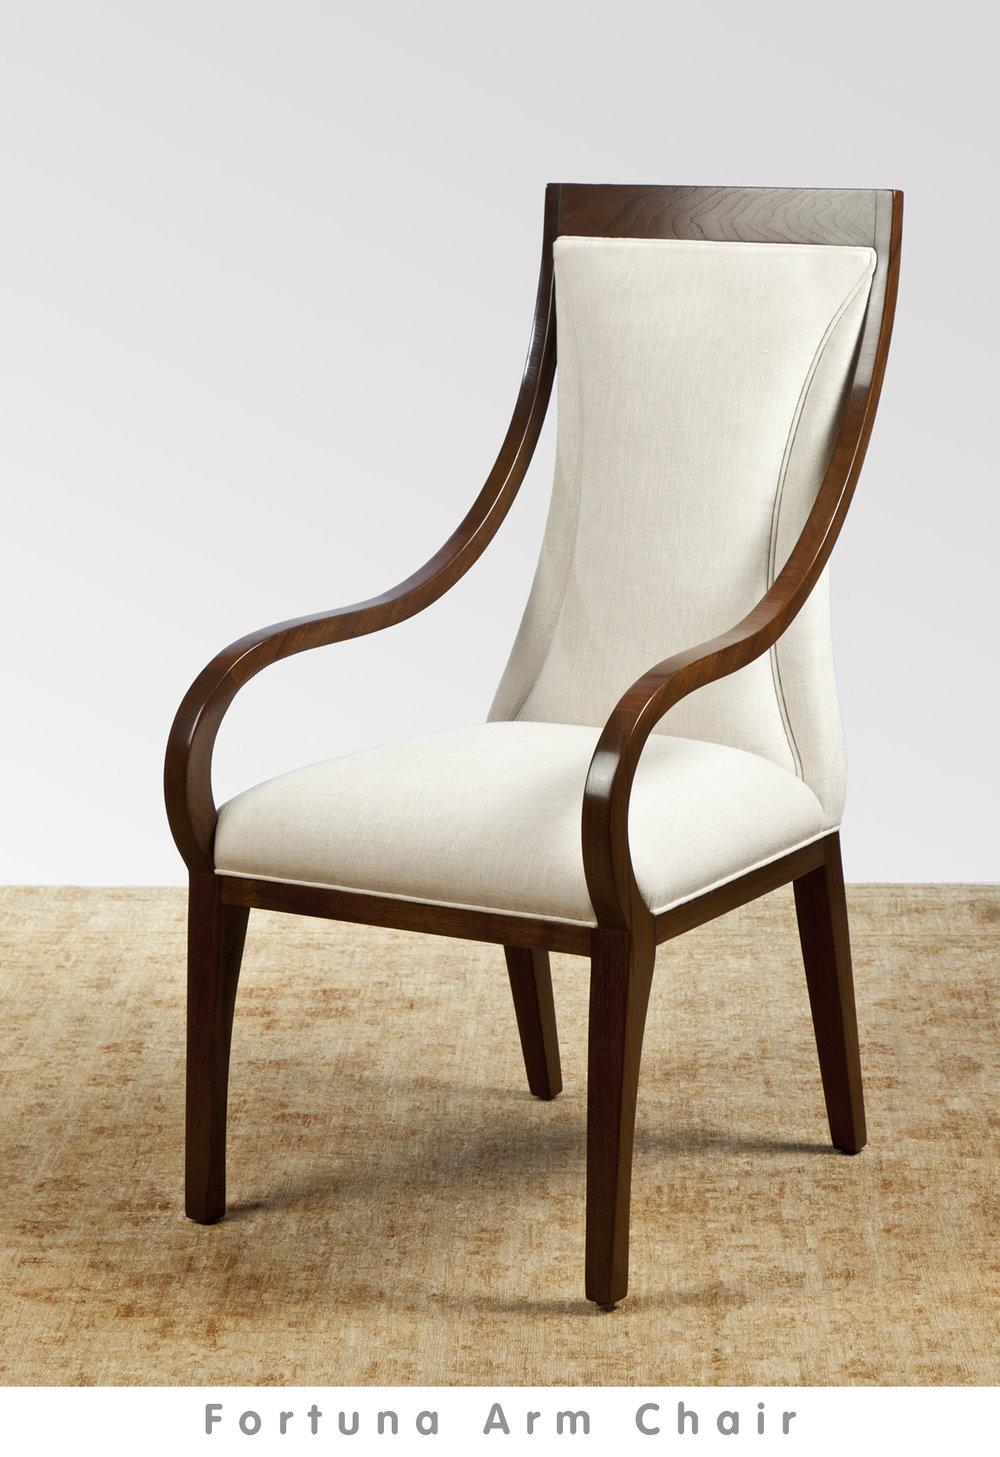 Fortuna Arm Chair